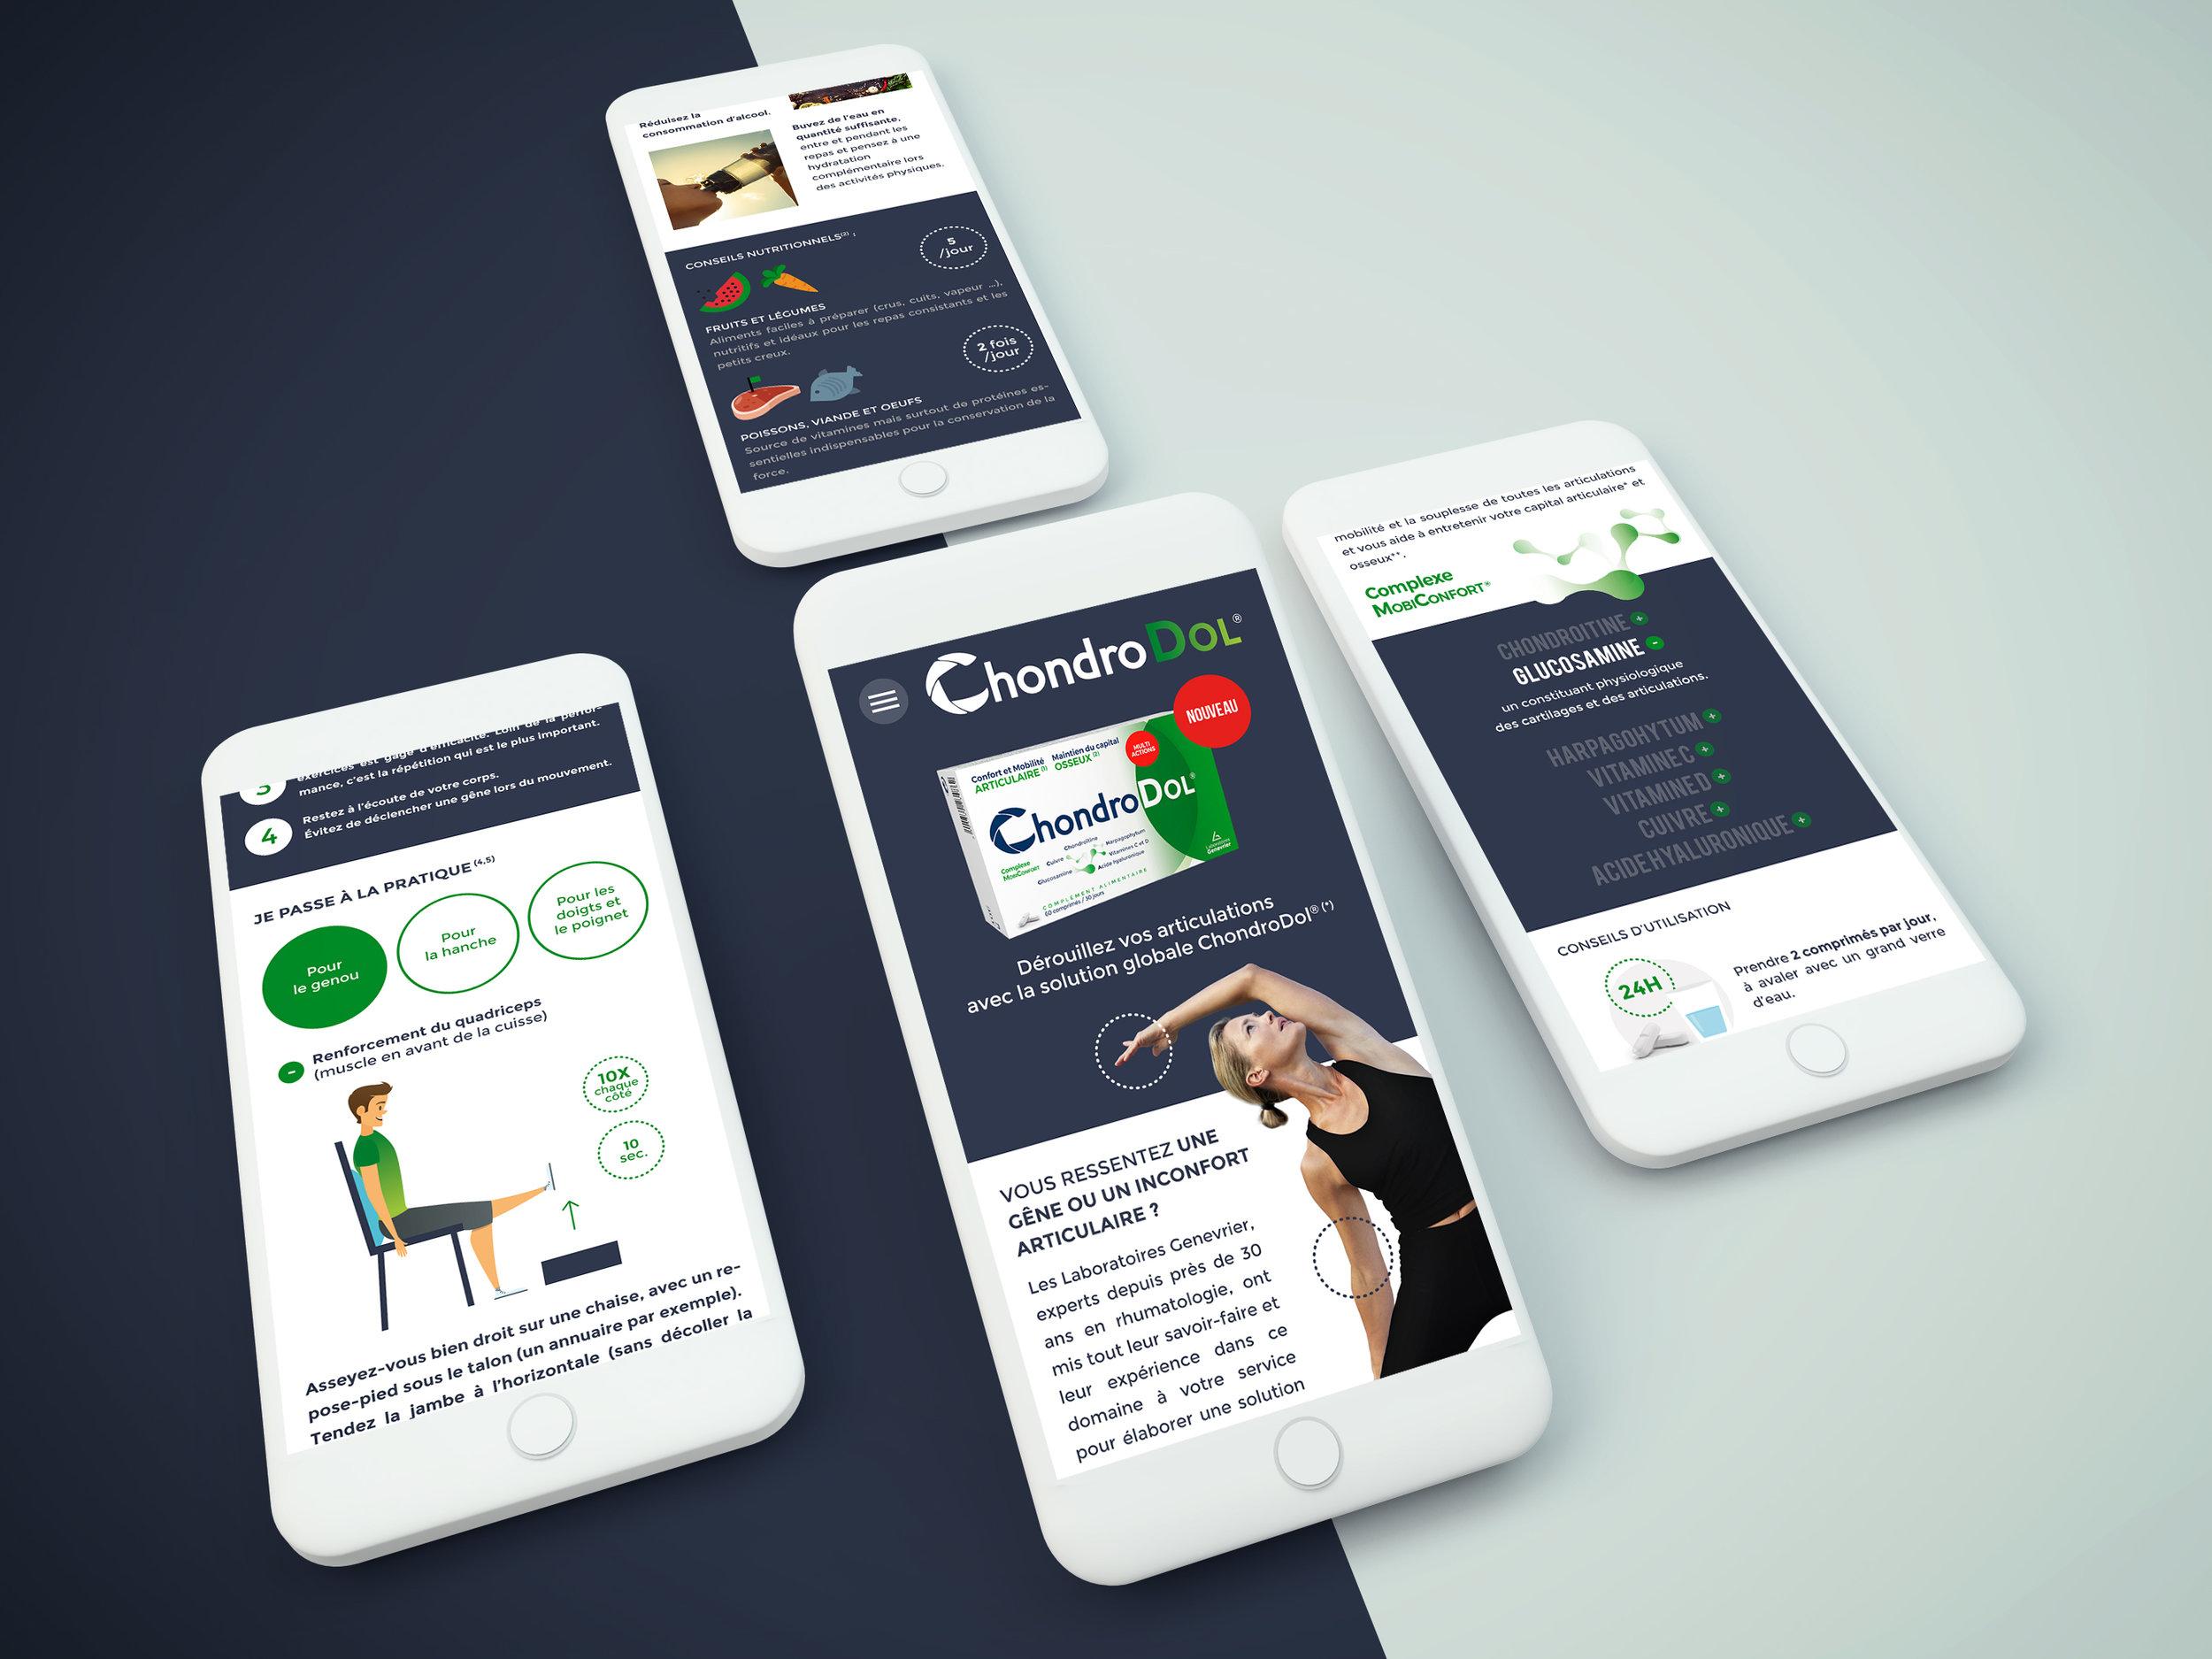 mobile_site_chondroDol.jpg